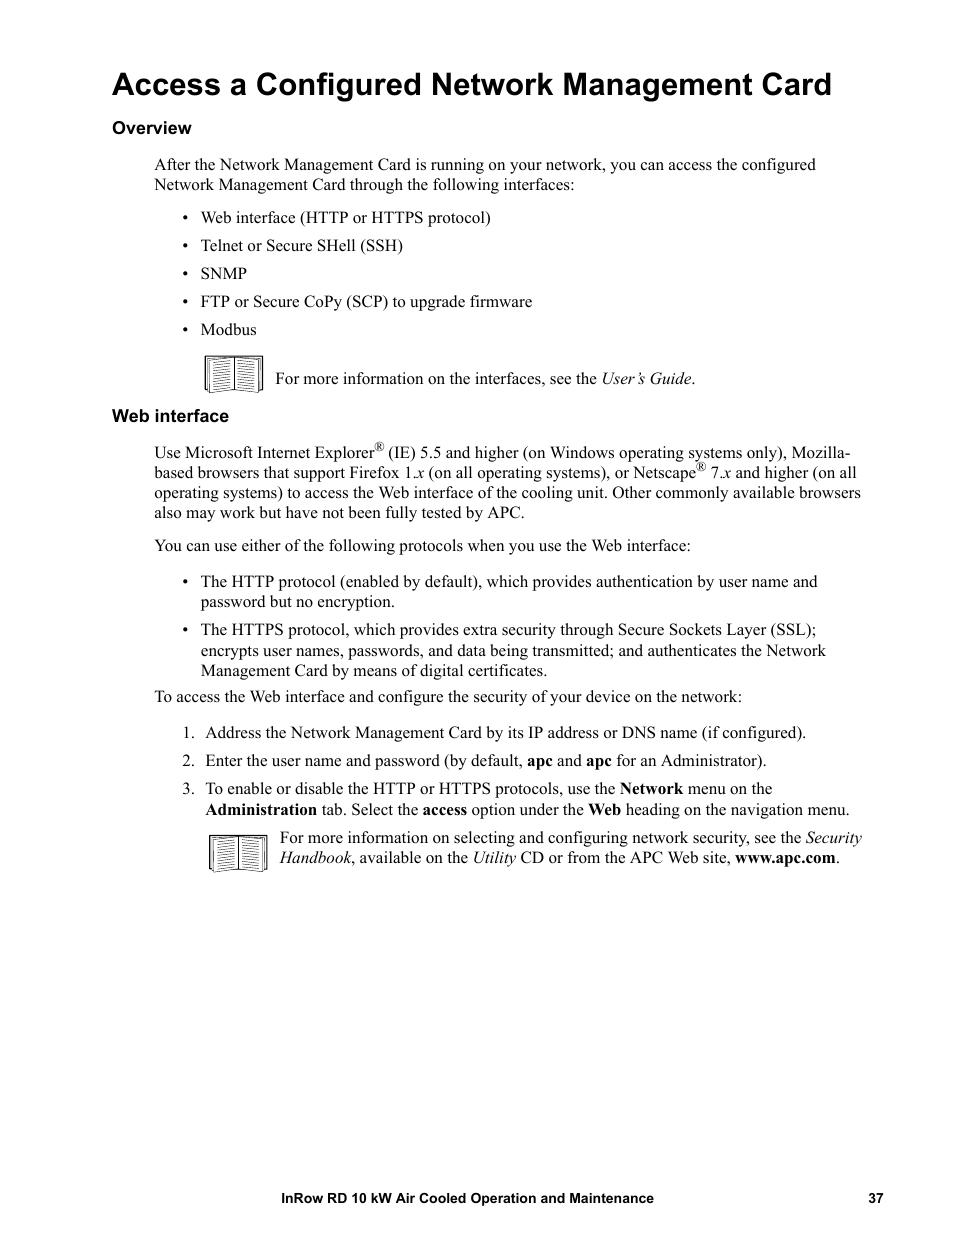 Access a configured network management card, Overview, Web